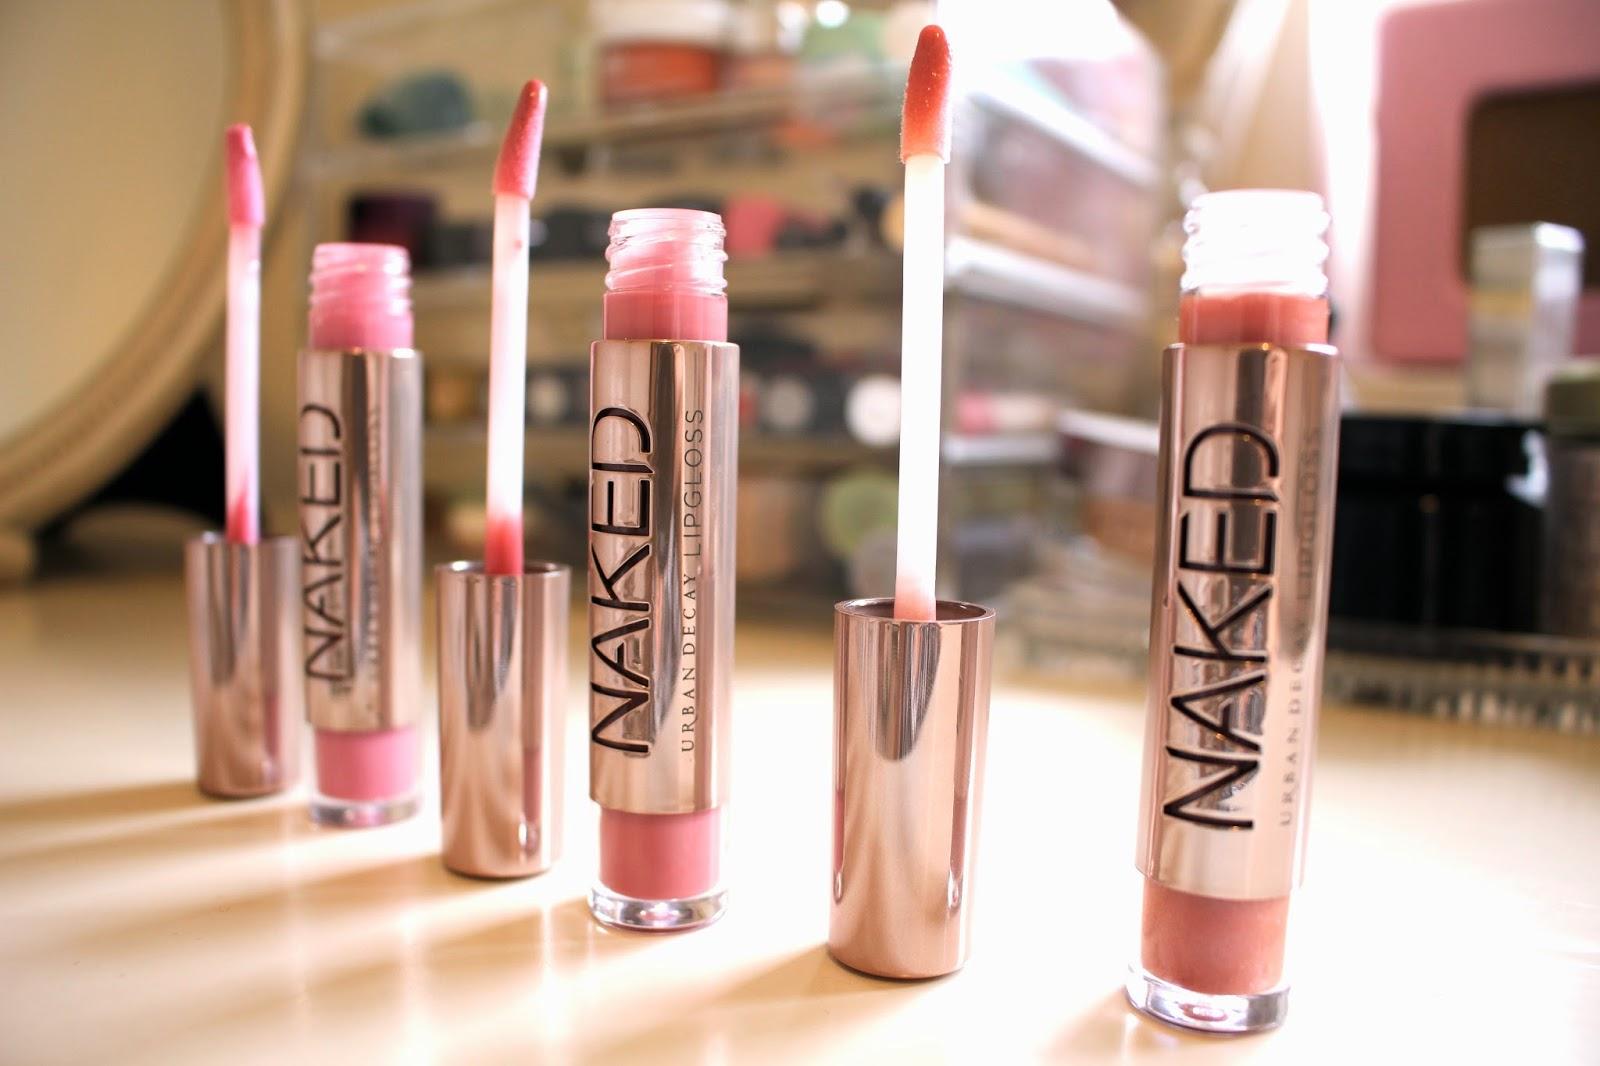 Urban Decay Naked Skin Ultra Nourishing Lipgloss for